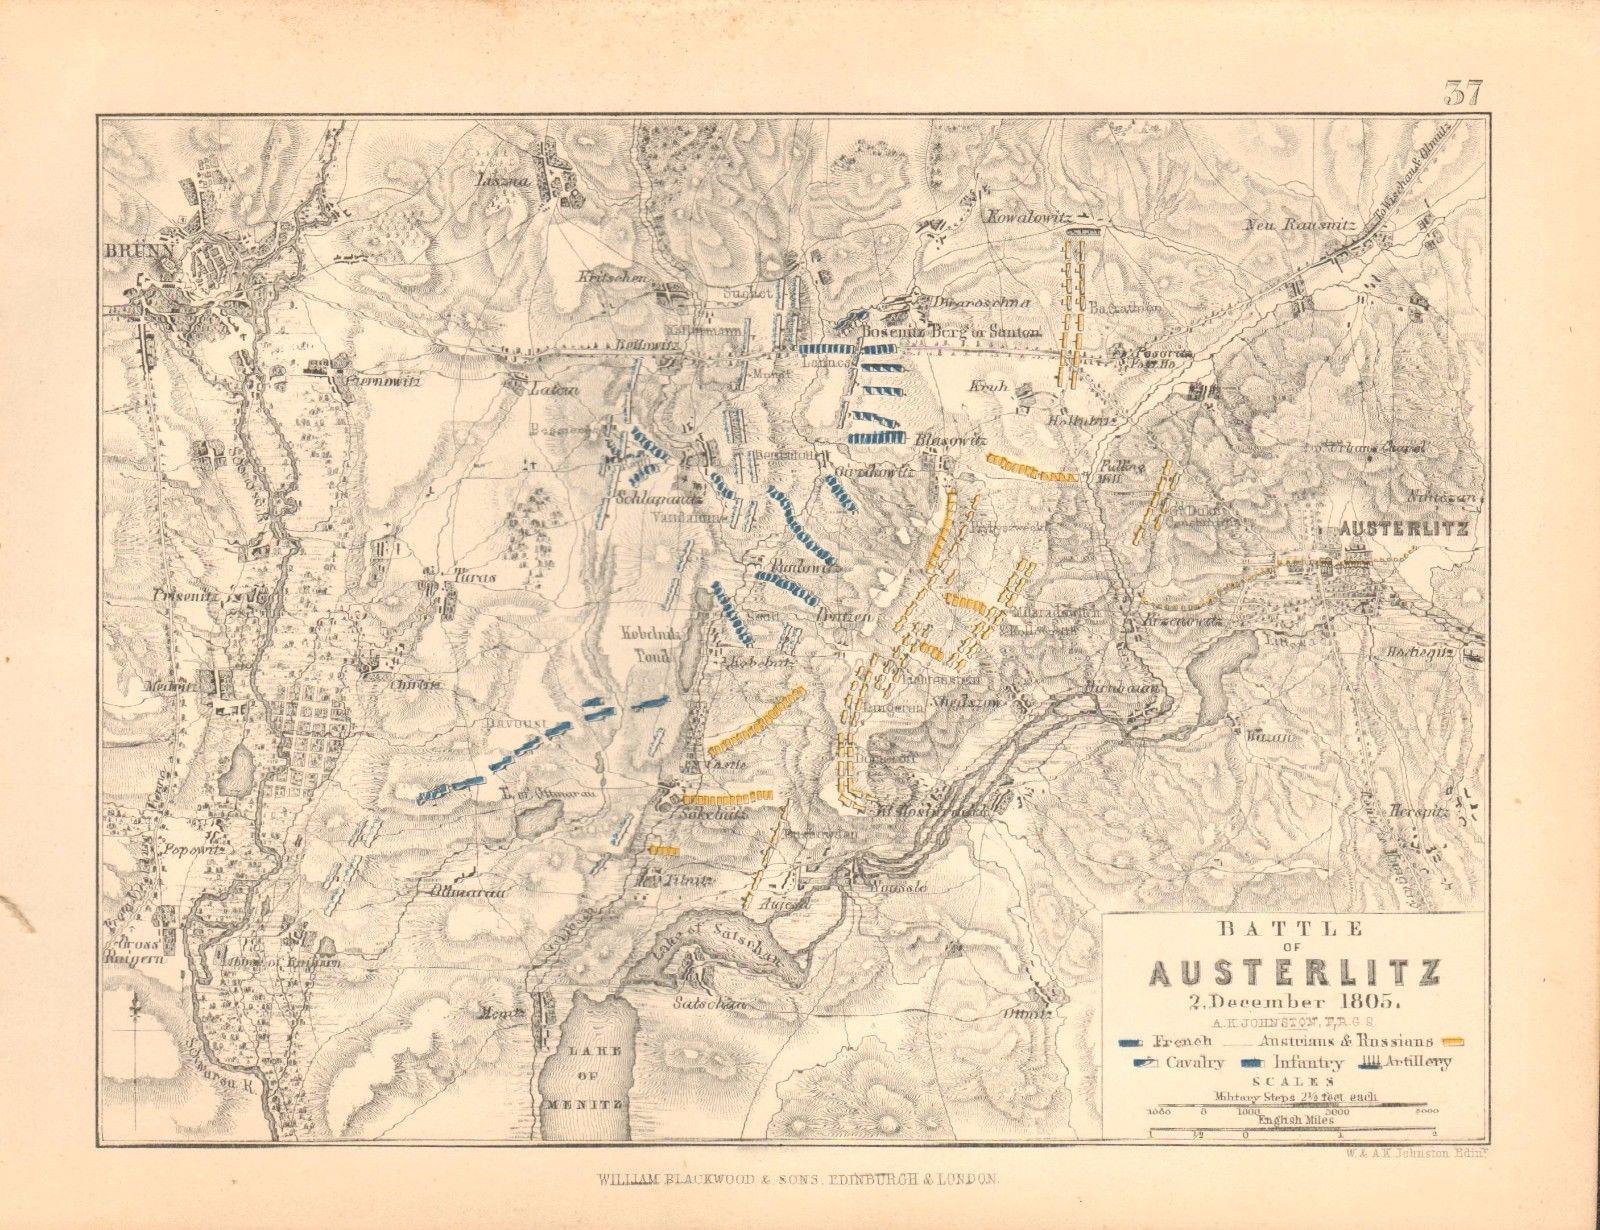 Austerlitz : 2 décembre 1805 623272PlanBattleofAusterlitz2ndDecember1805